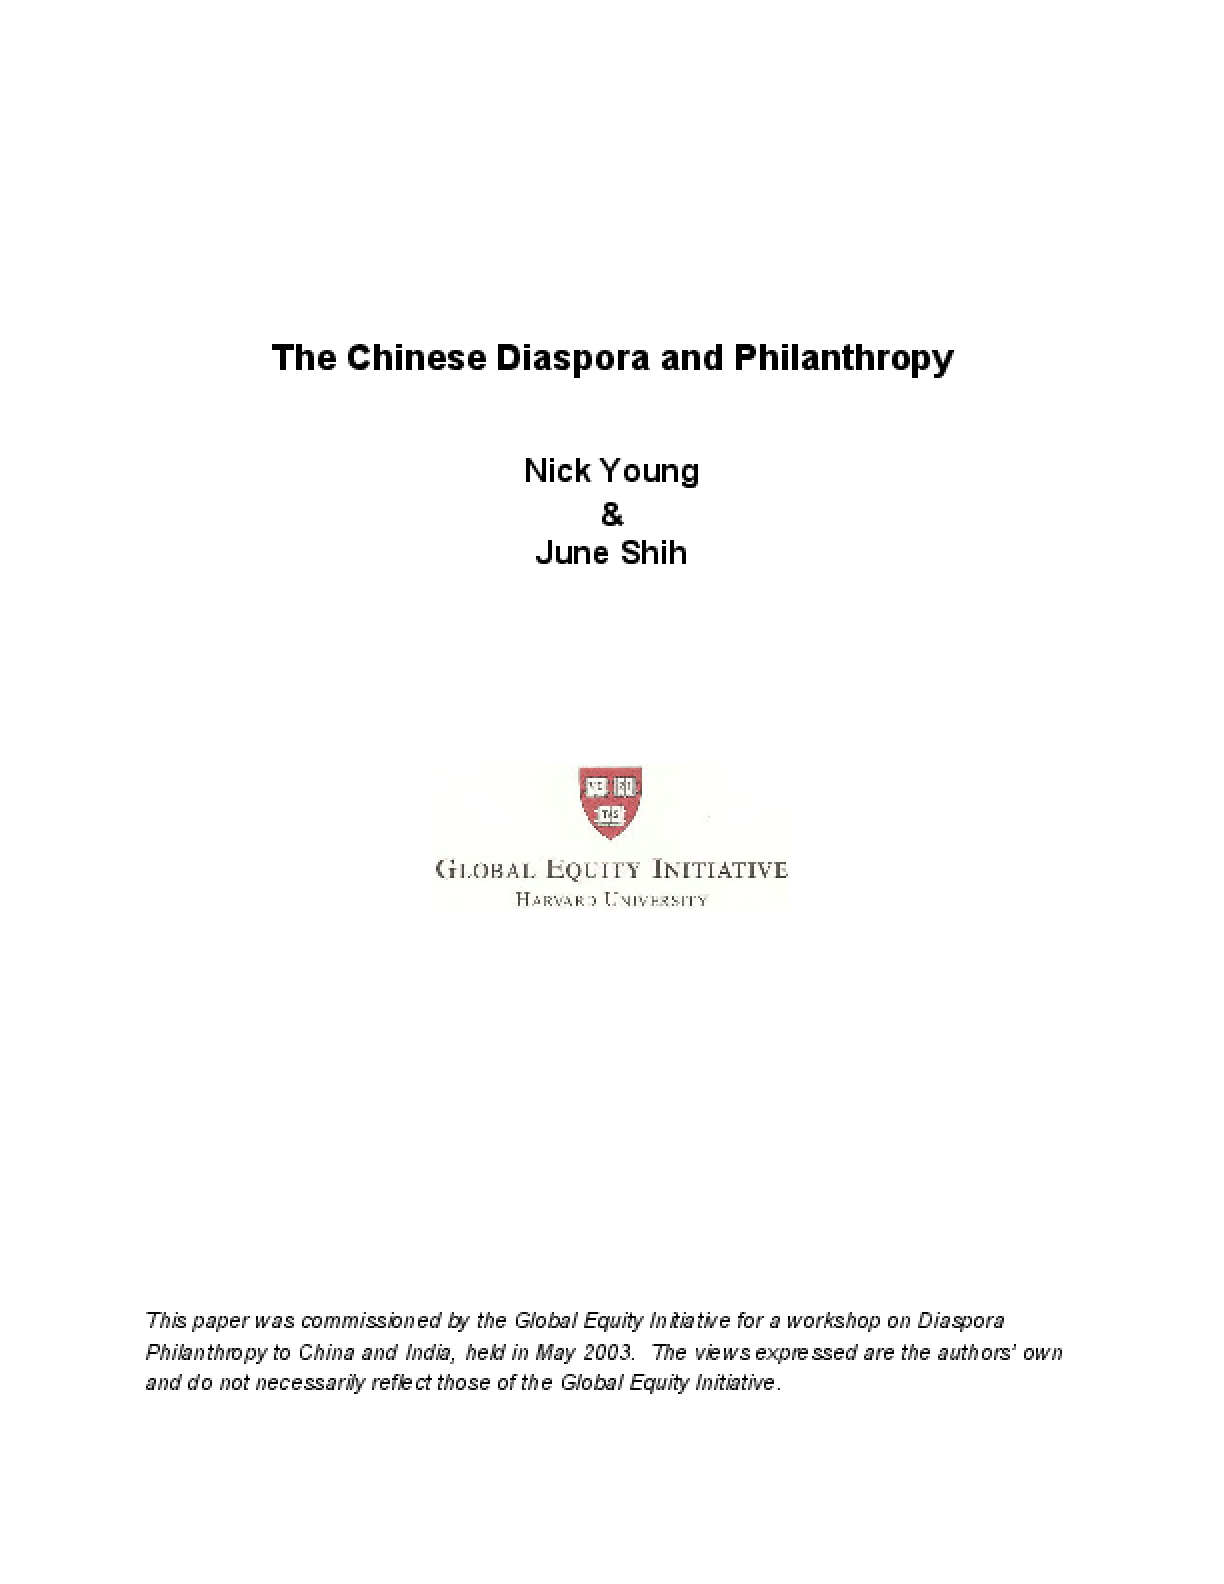 The Chinese Diaspora and Philanthropy